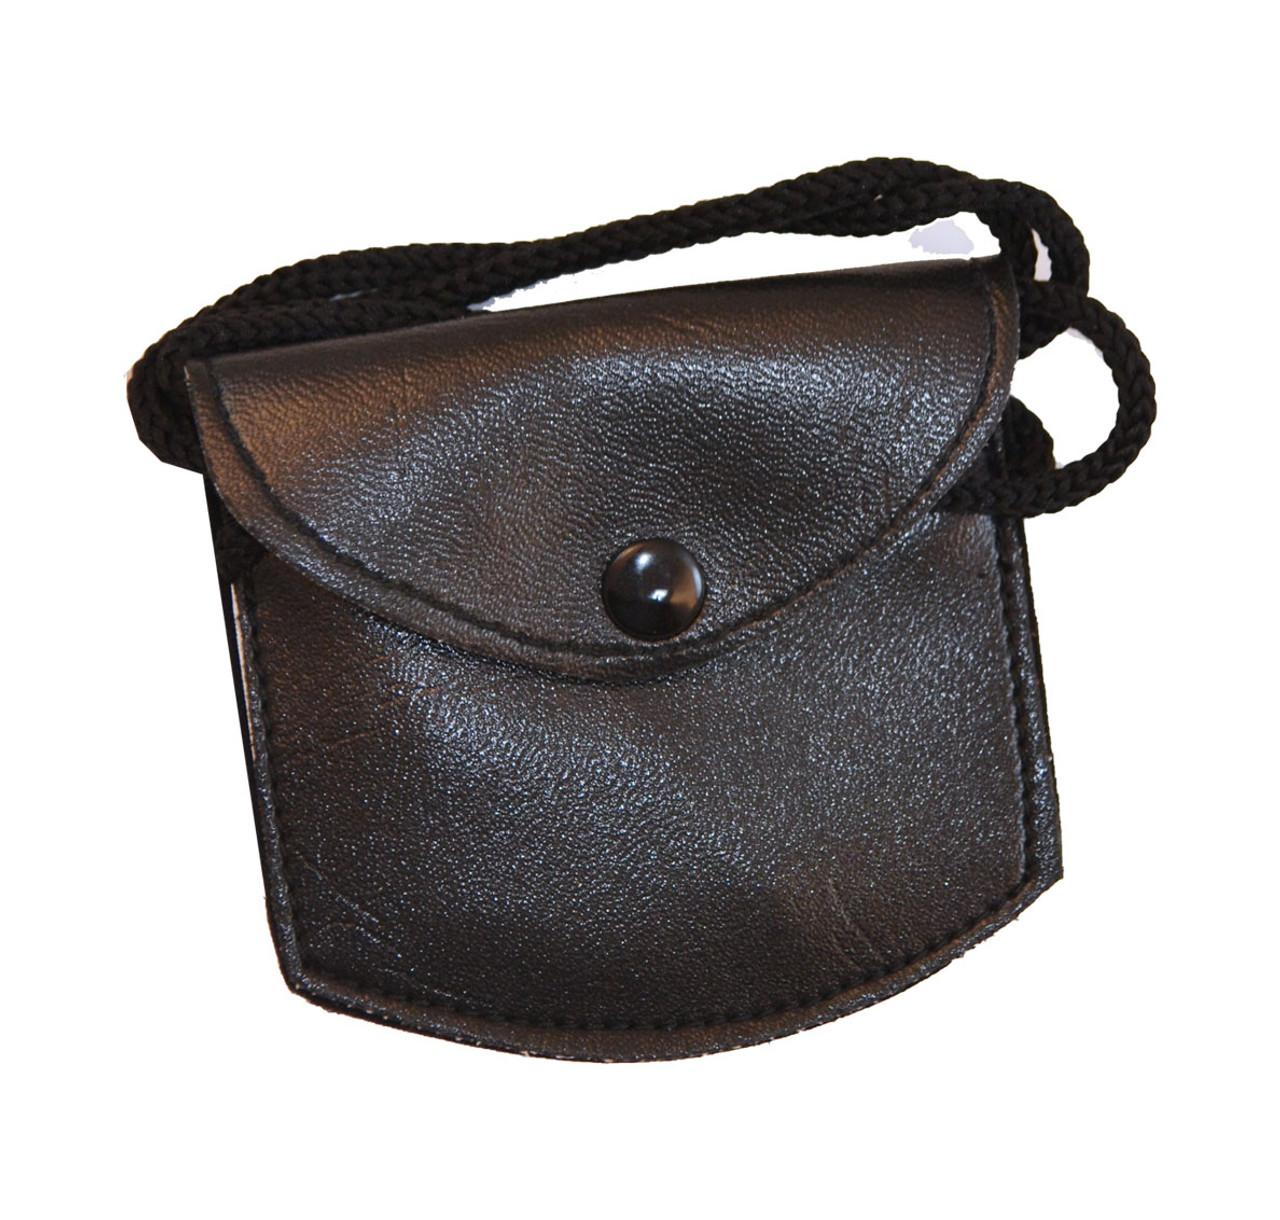 Small leather burse